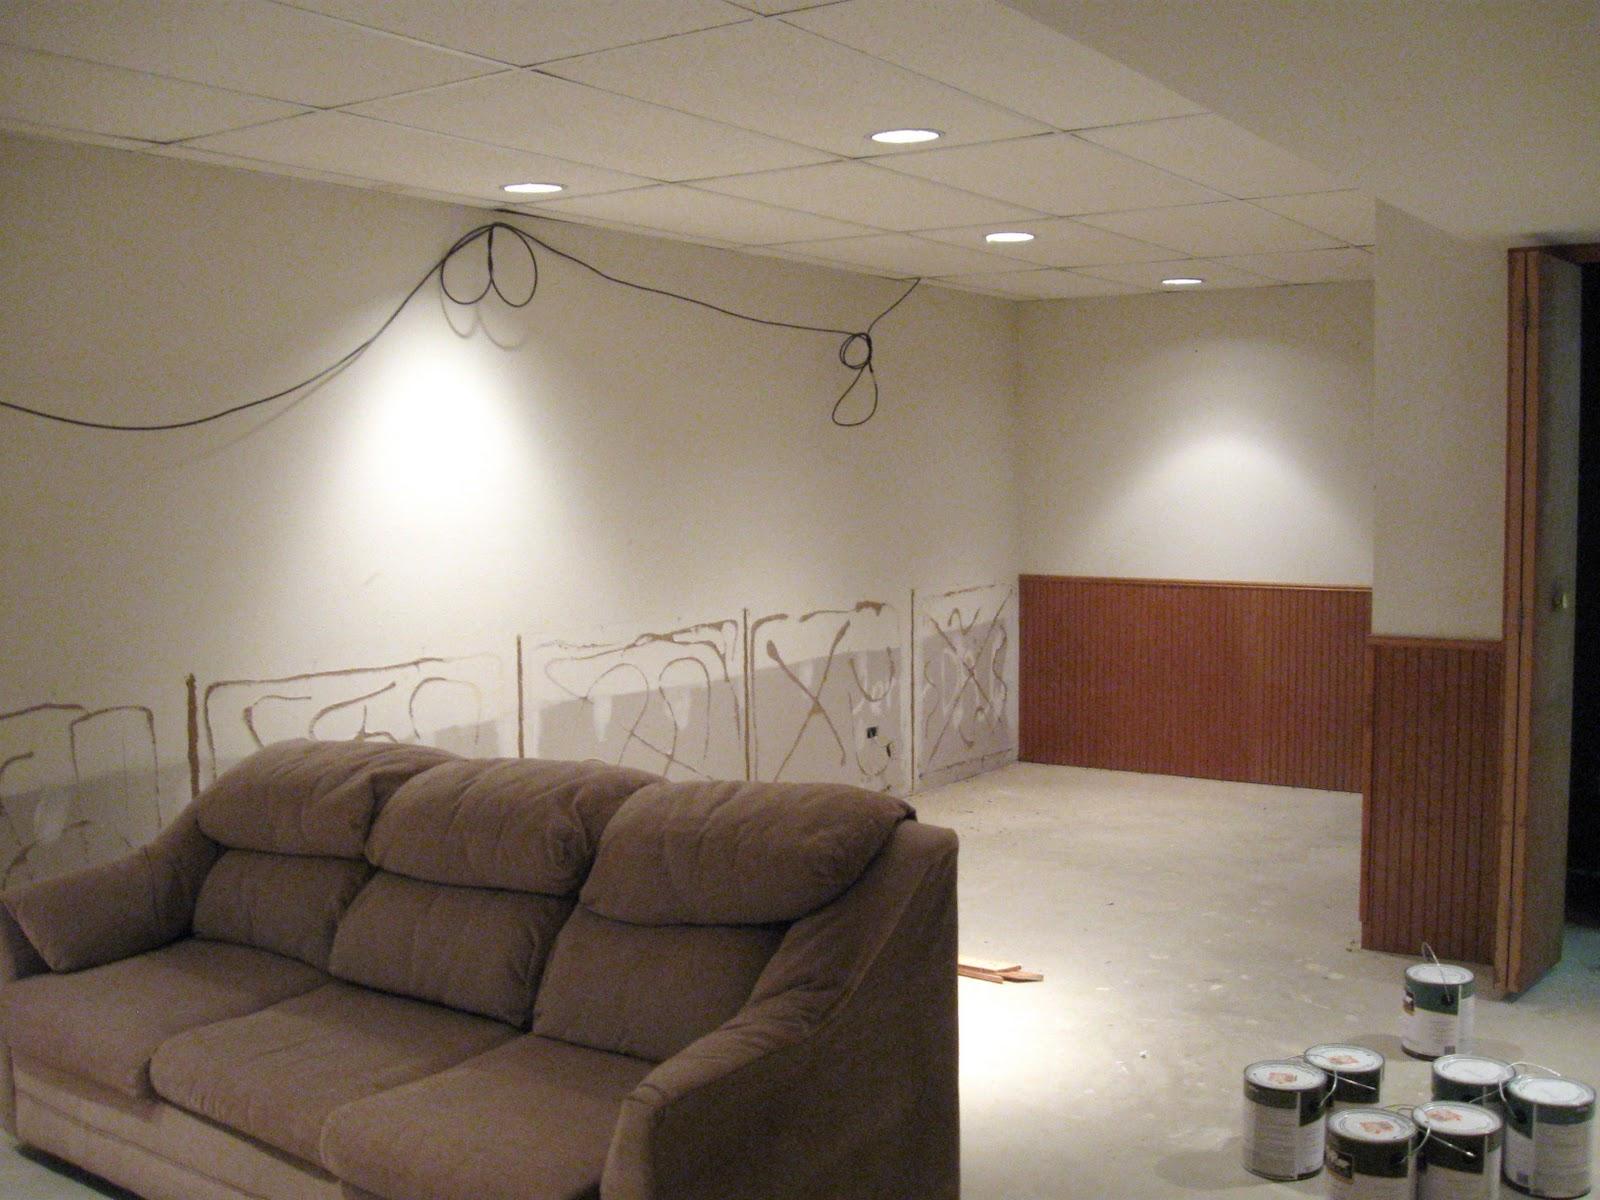 Lighting Basement Washroom Stairs: COMFY HOUSE: Basement Re-do